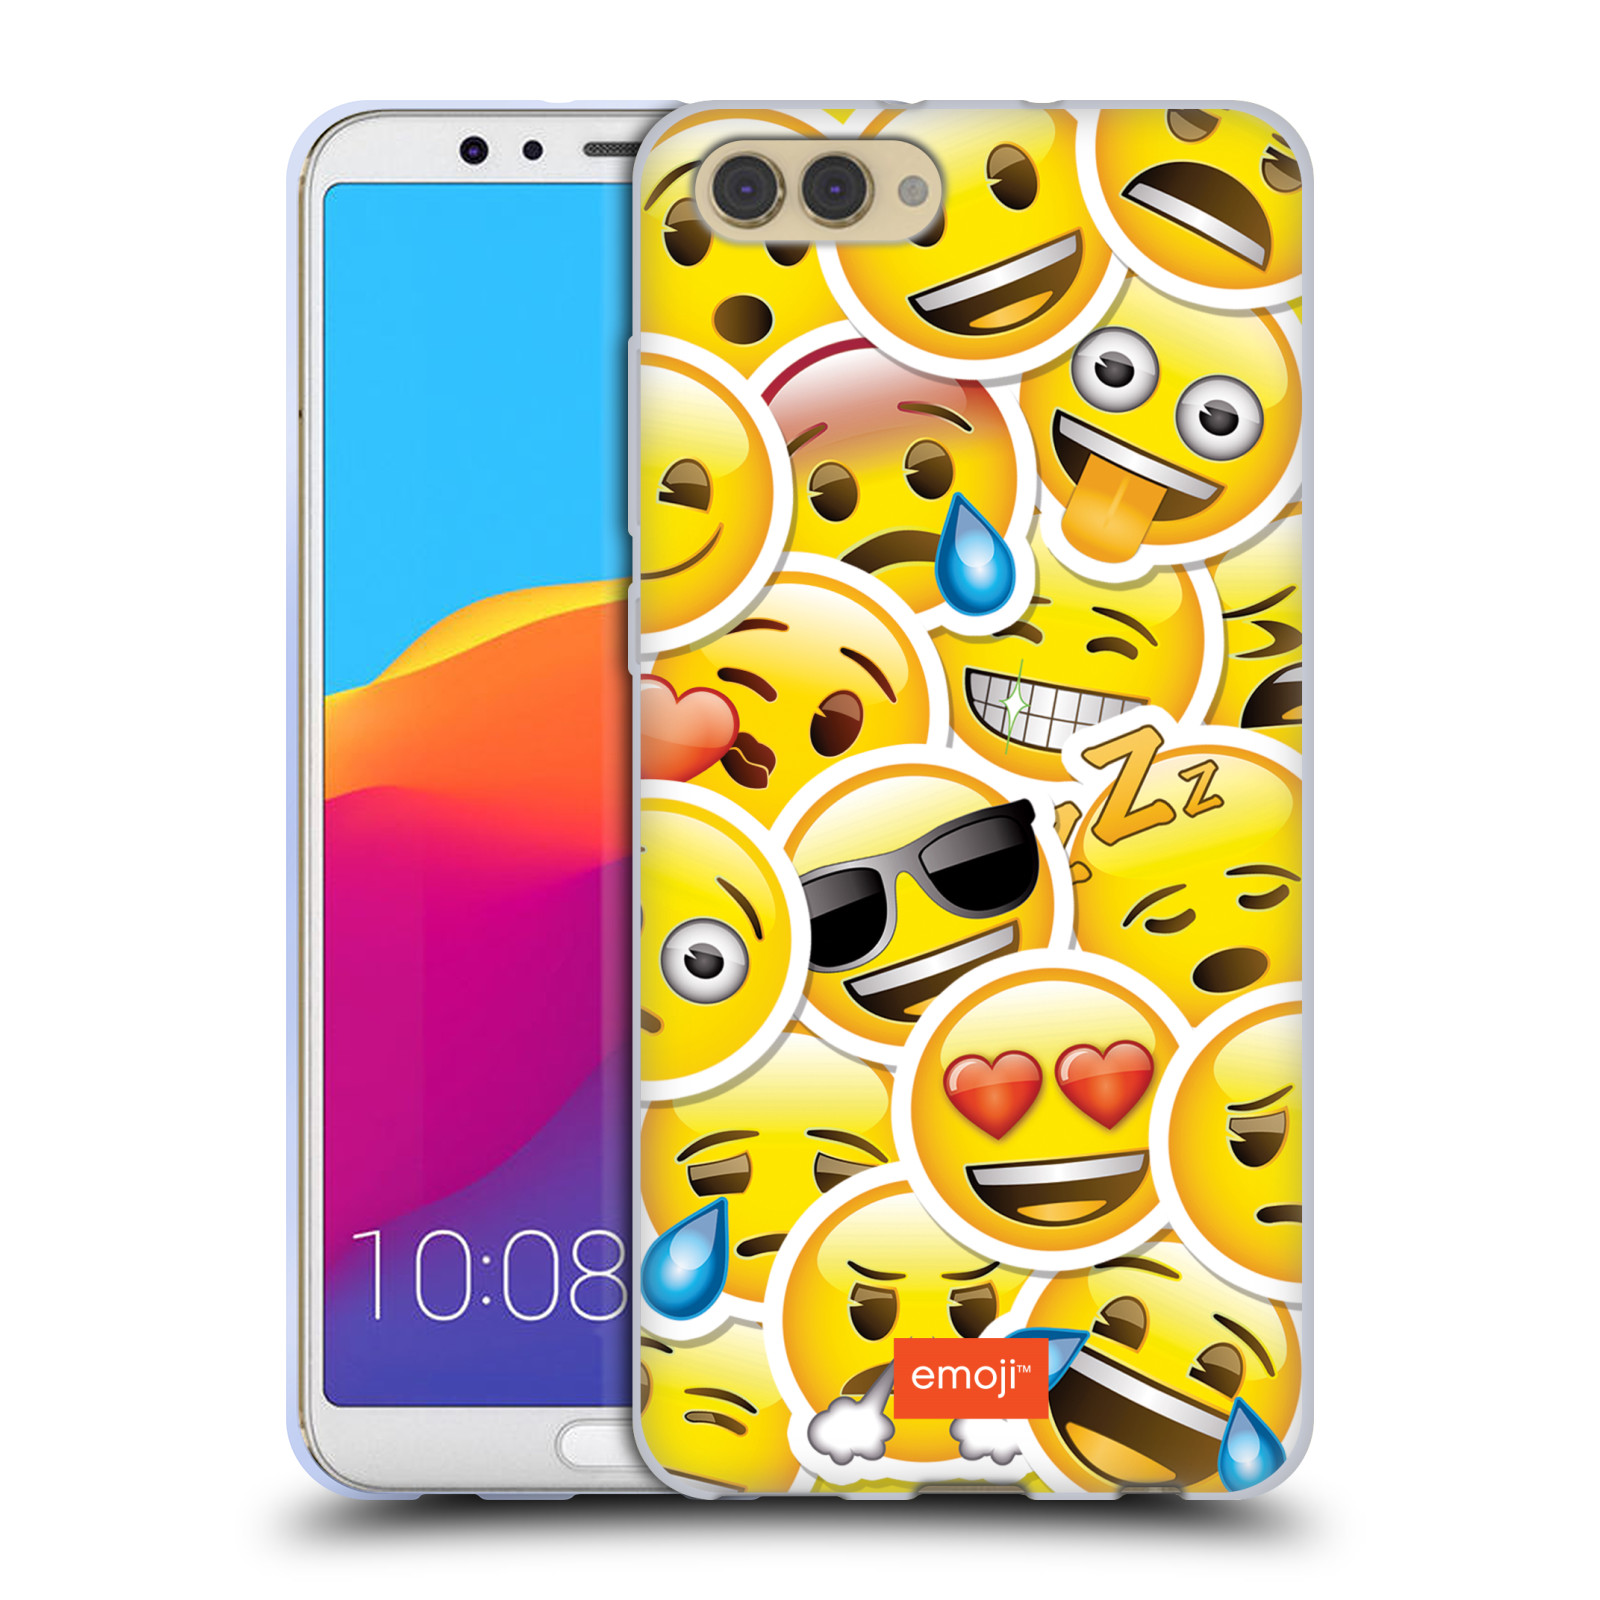 HEAD CASE silikonový obal na mobil Huawei HONOR VIEW 10 / V10 smajlík oficiální kryt EMOJI velcí smajlíci nálepky